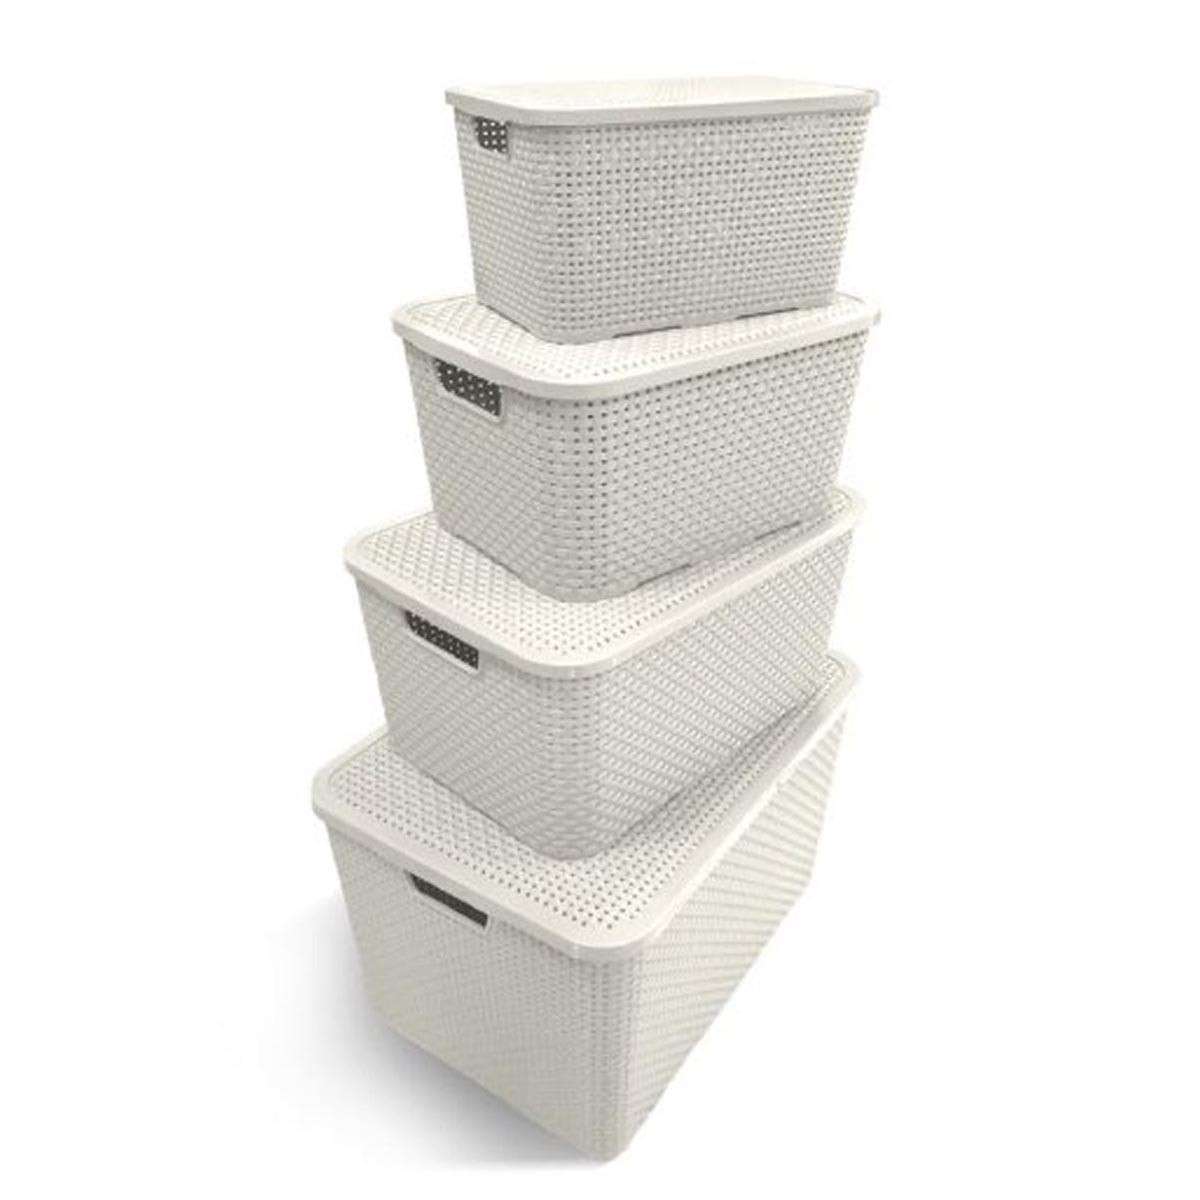 Caixa Organizadora Plástica Branca Cesto Rattan 15 Litros Com Tampa